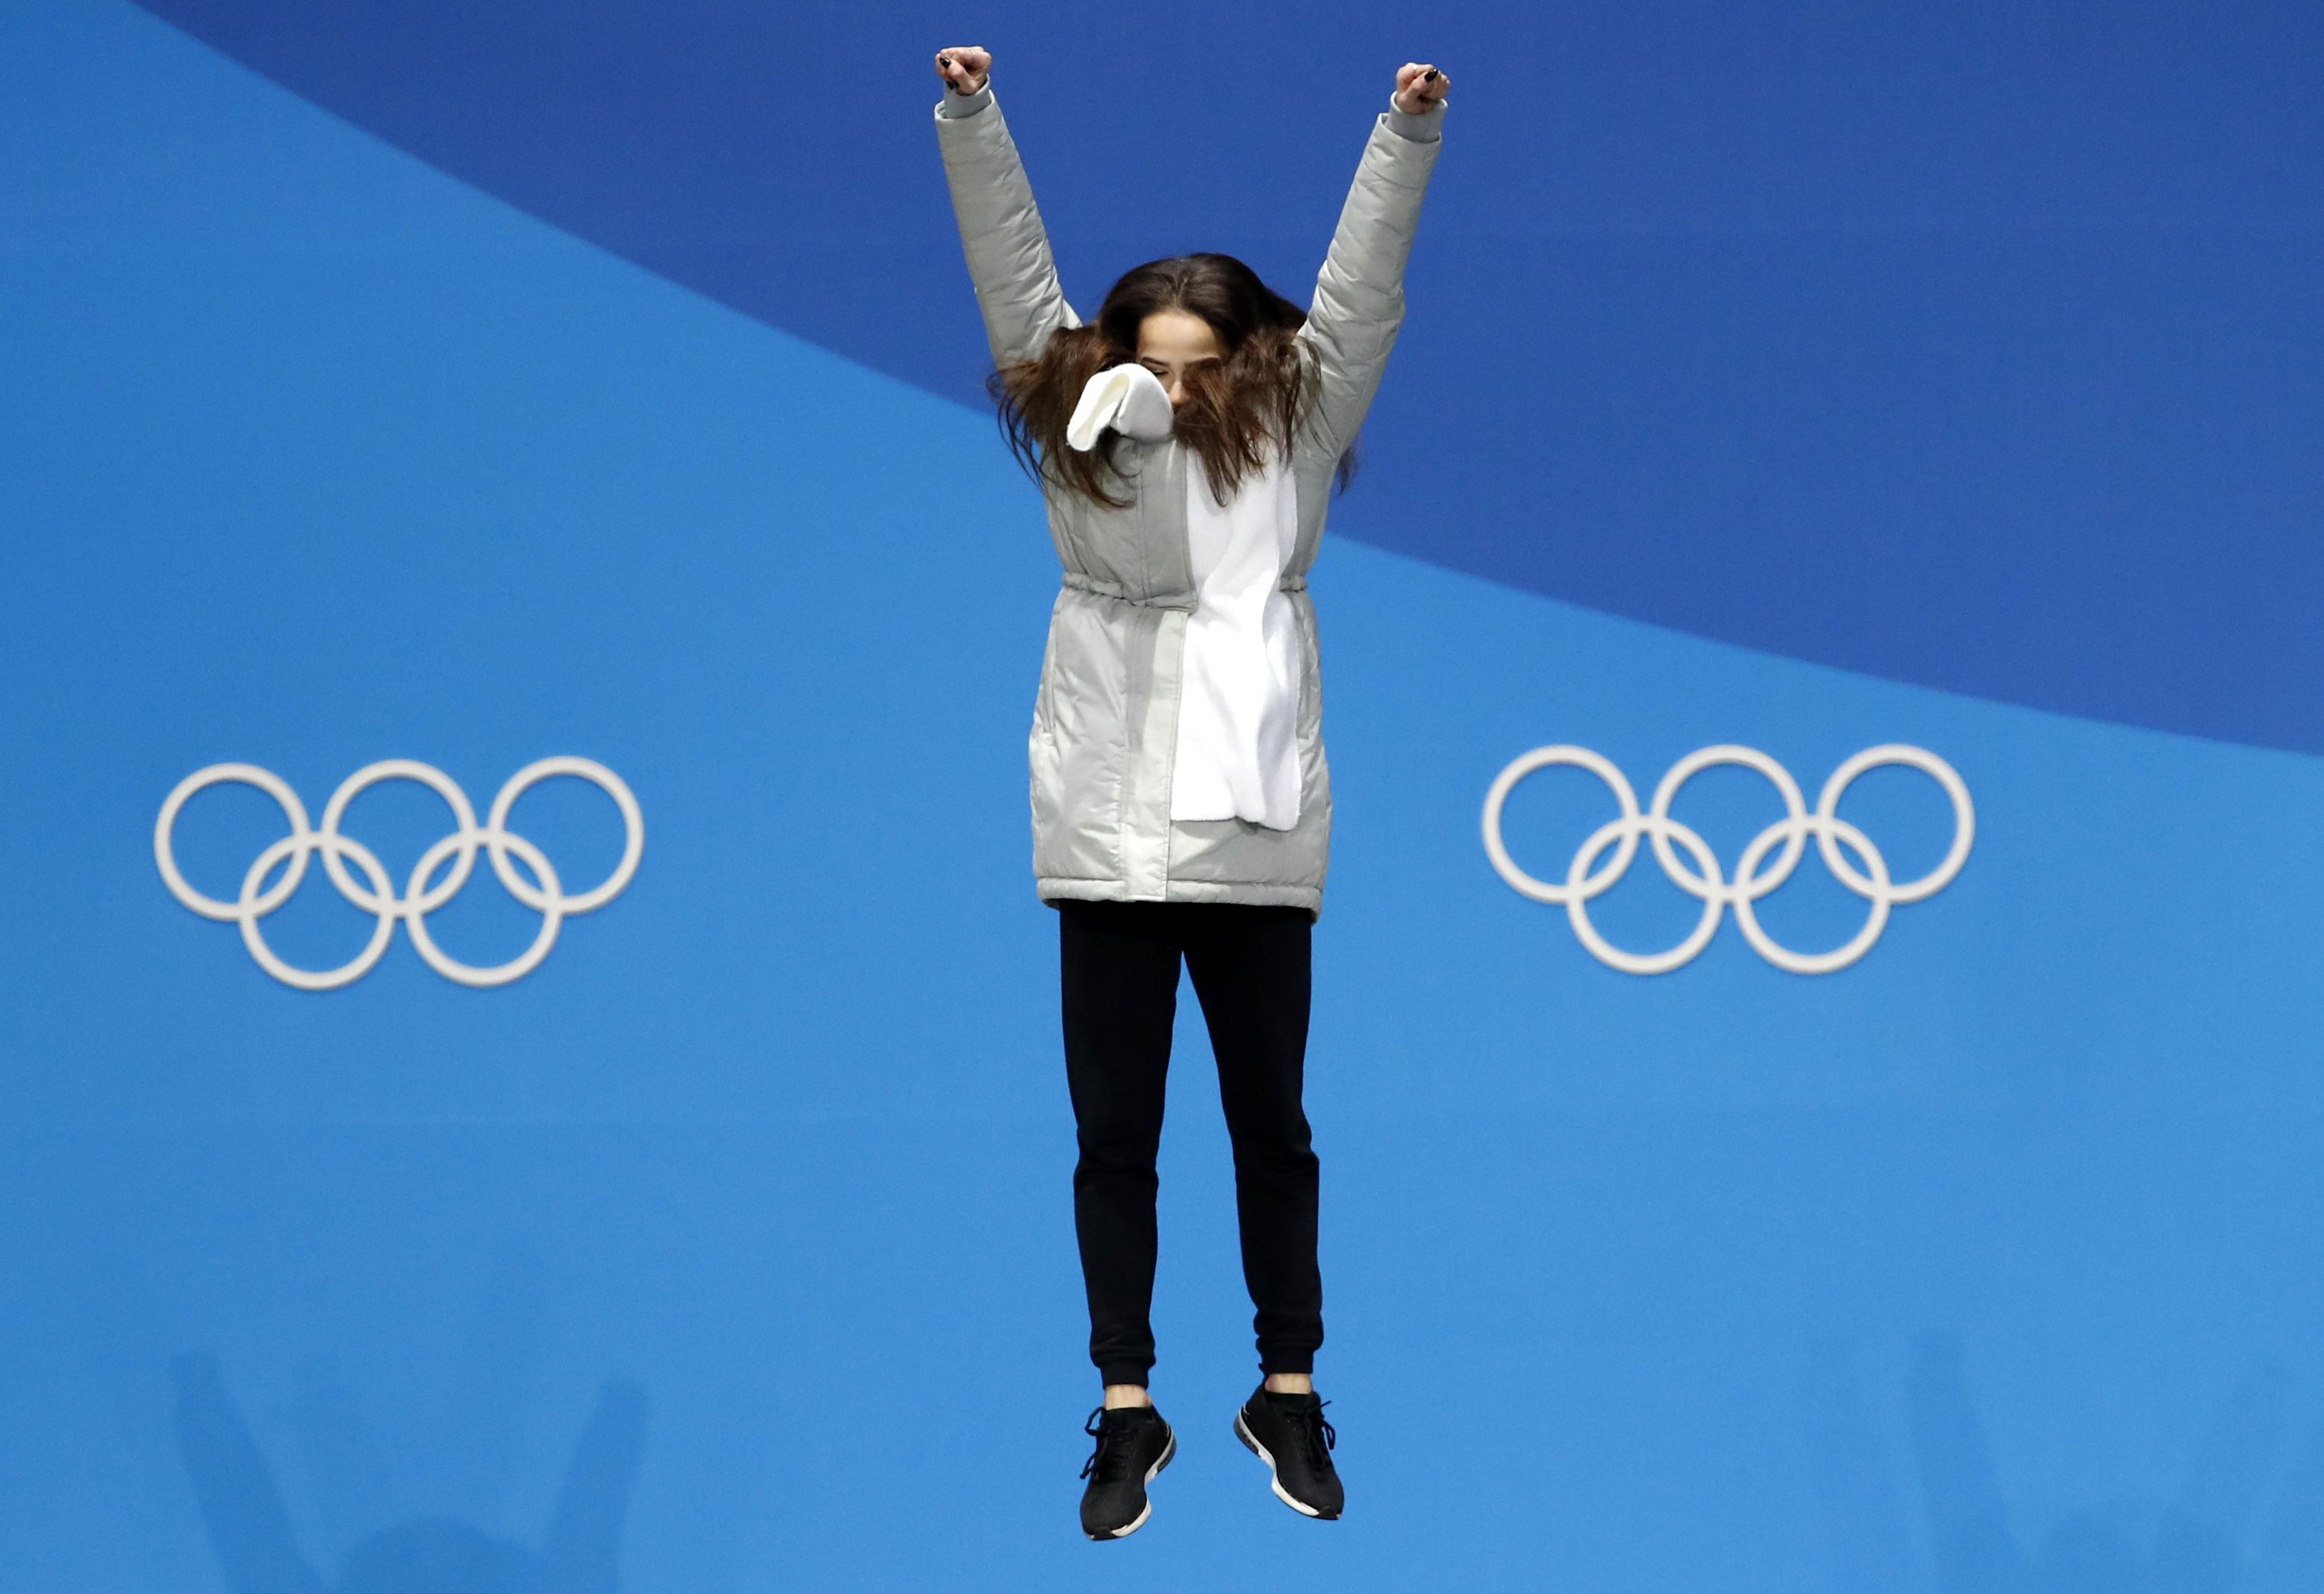 Alina Zagitova Outduels Evgenia Medvedeva for Gold in Figure Skating